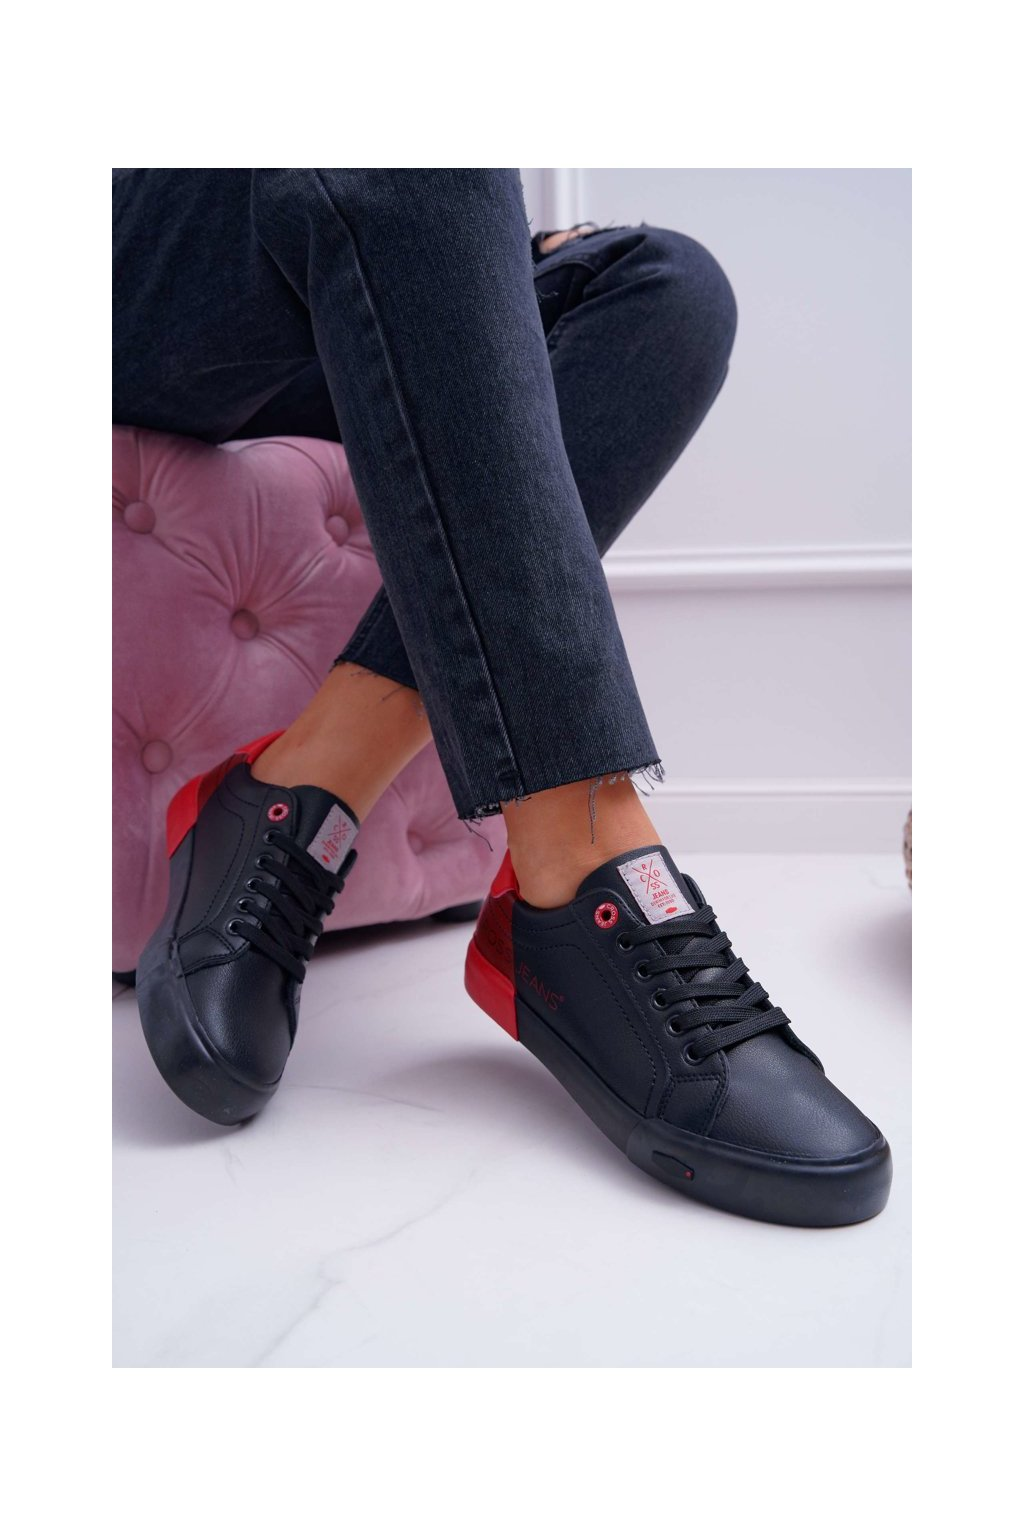 Dámske tenisky farba čierna kód obuvi EE2R4019C BLK